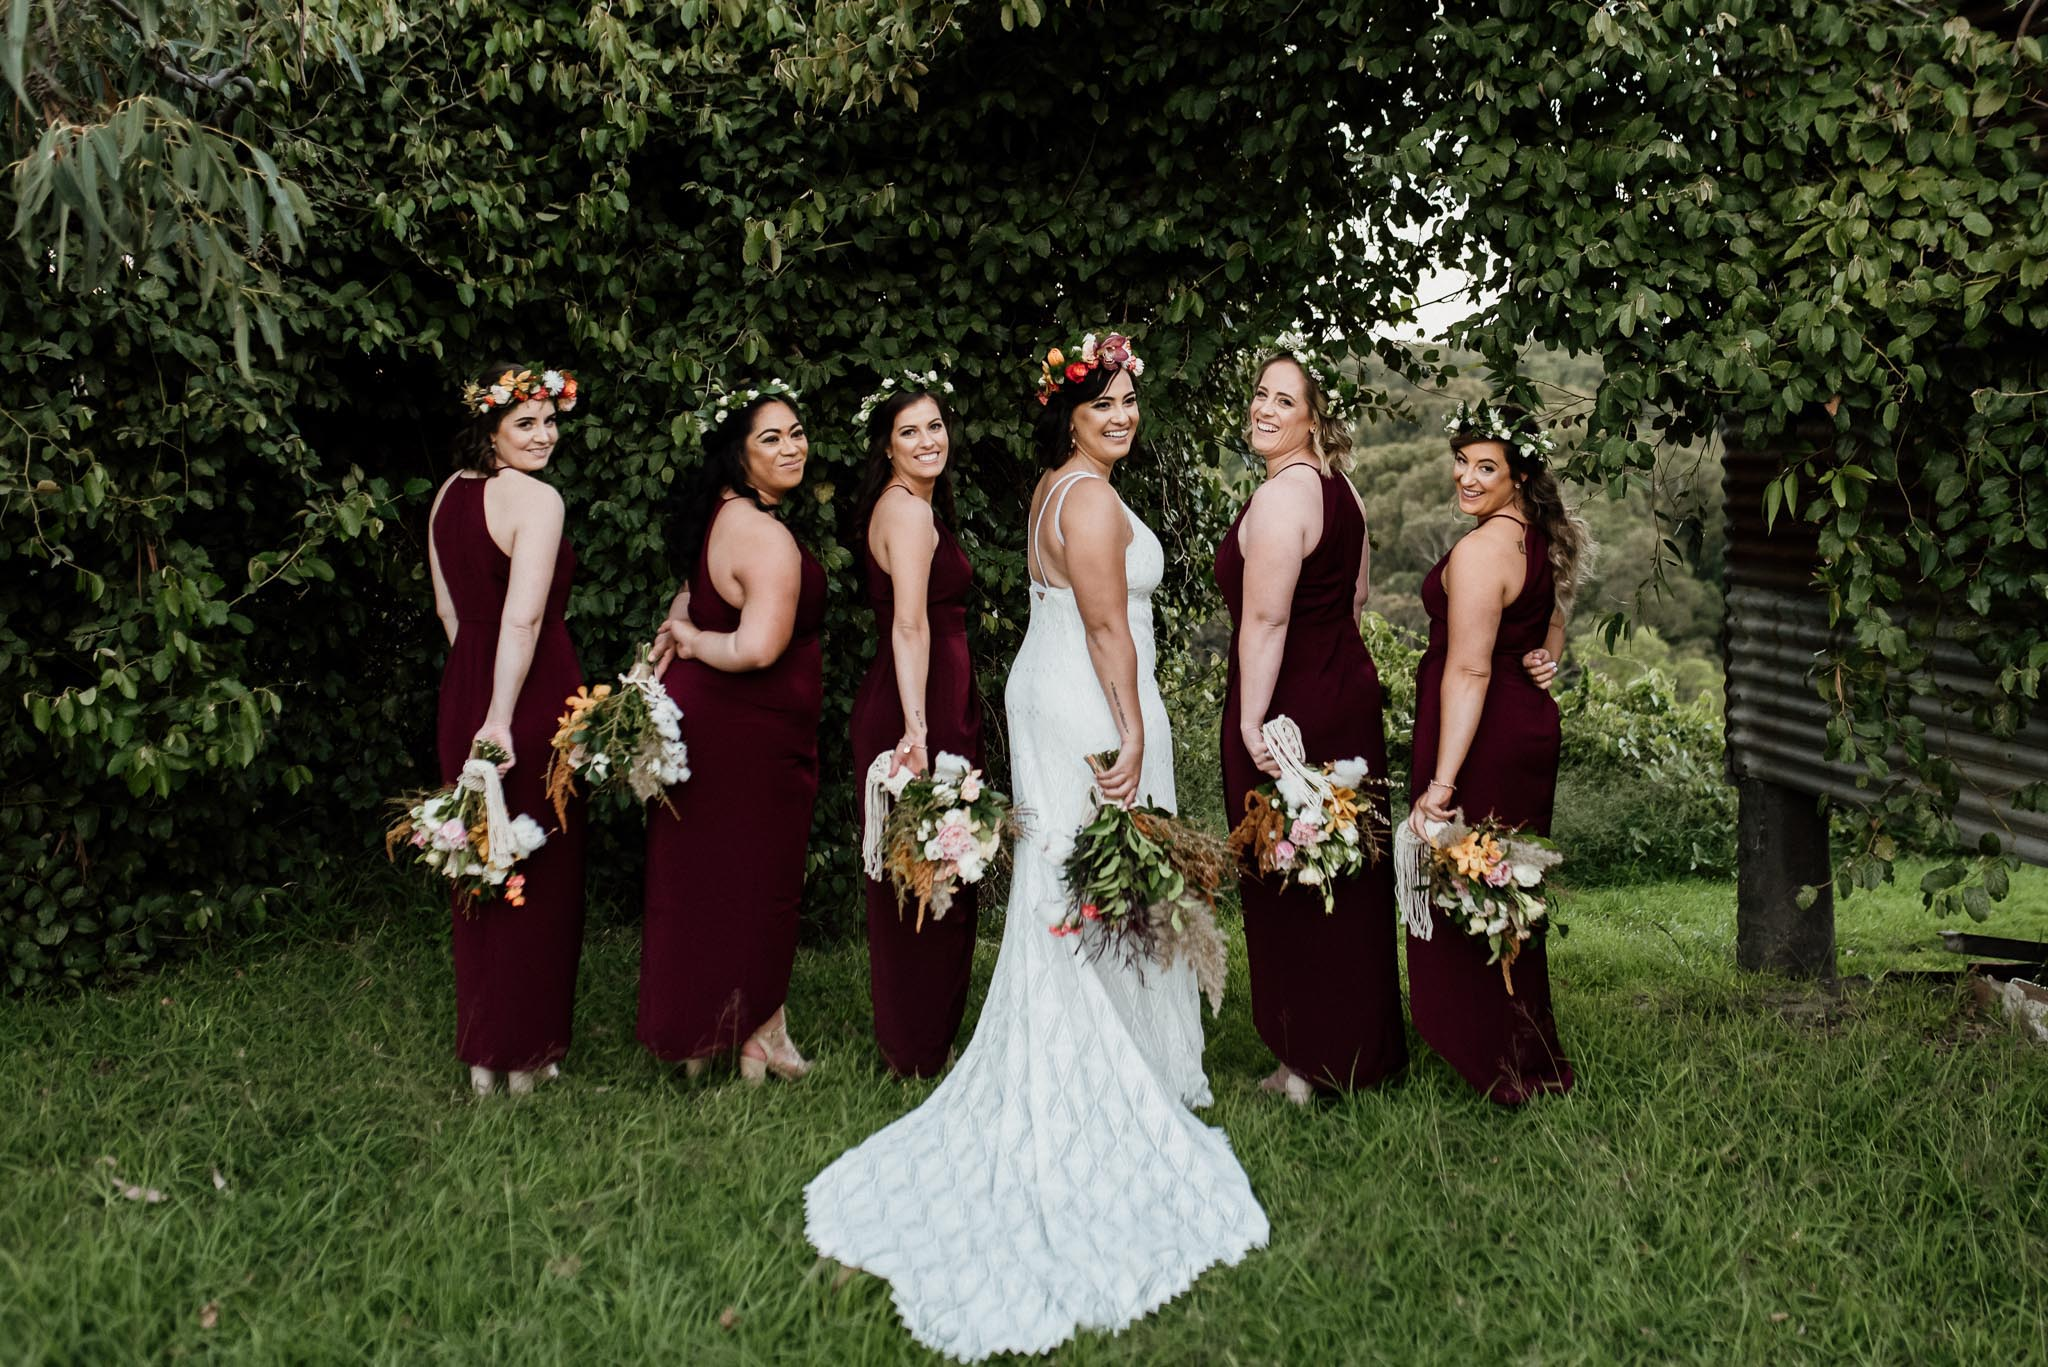 LOMONACO-WEDDING-BLOG-108.jpg